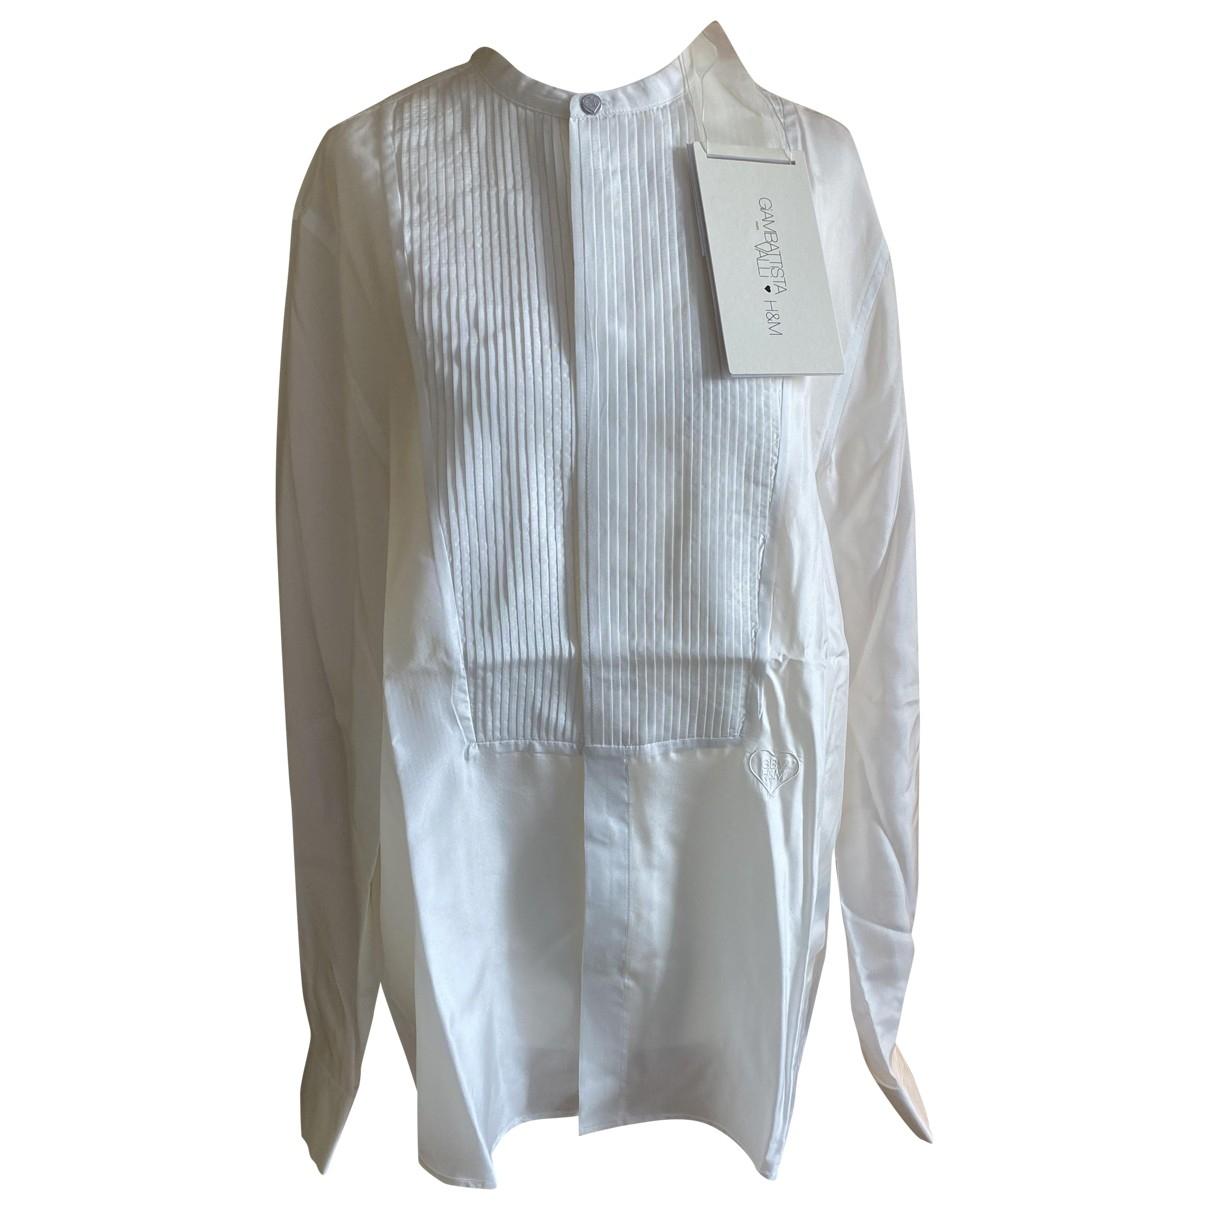 Giambattista Valli X H&m \N White Silk Shirts for Men M International